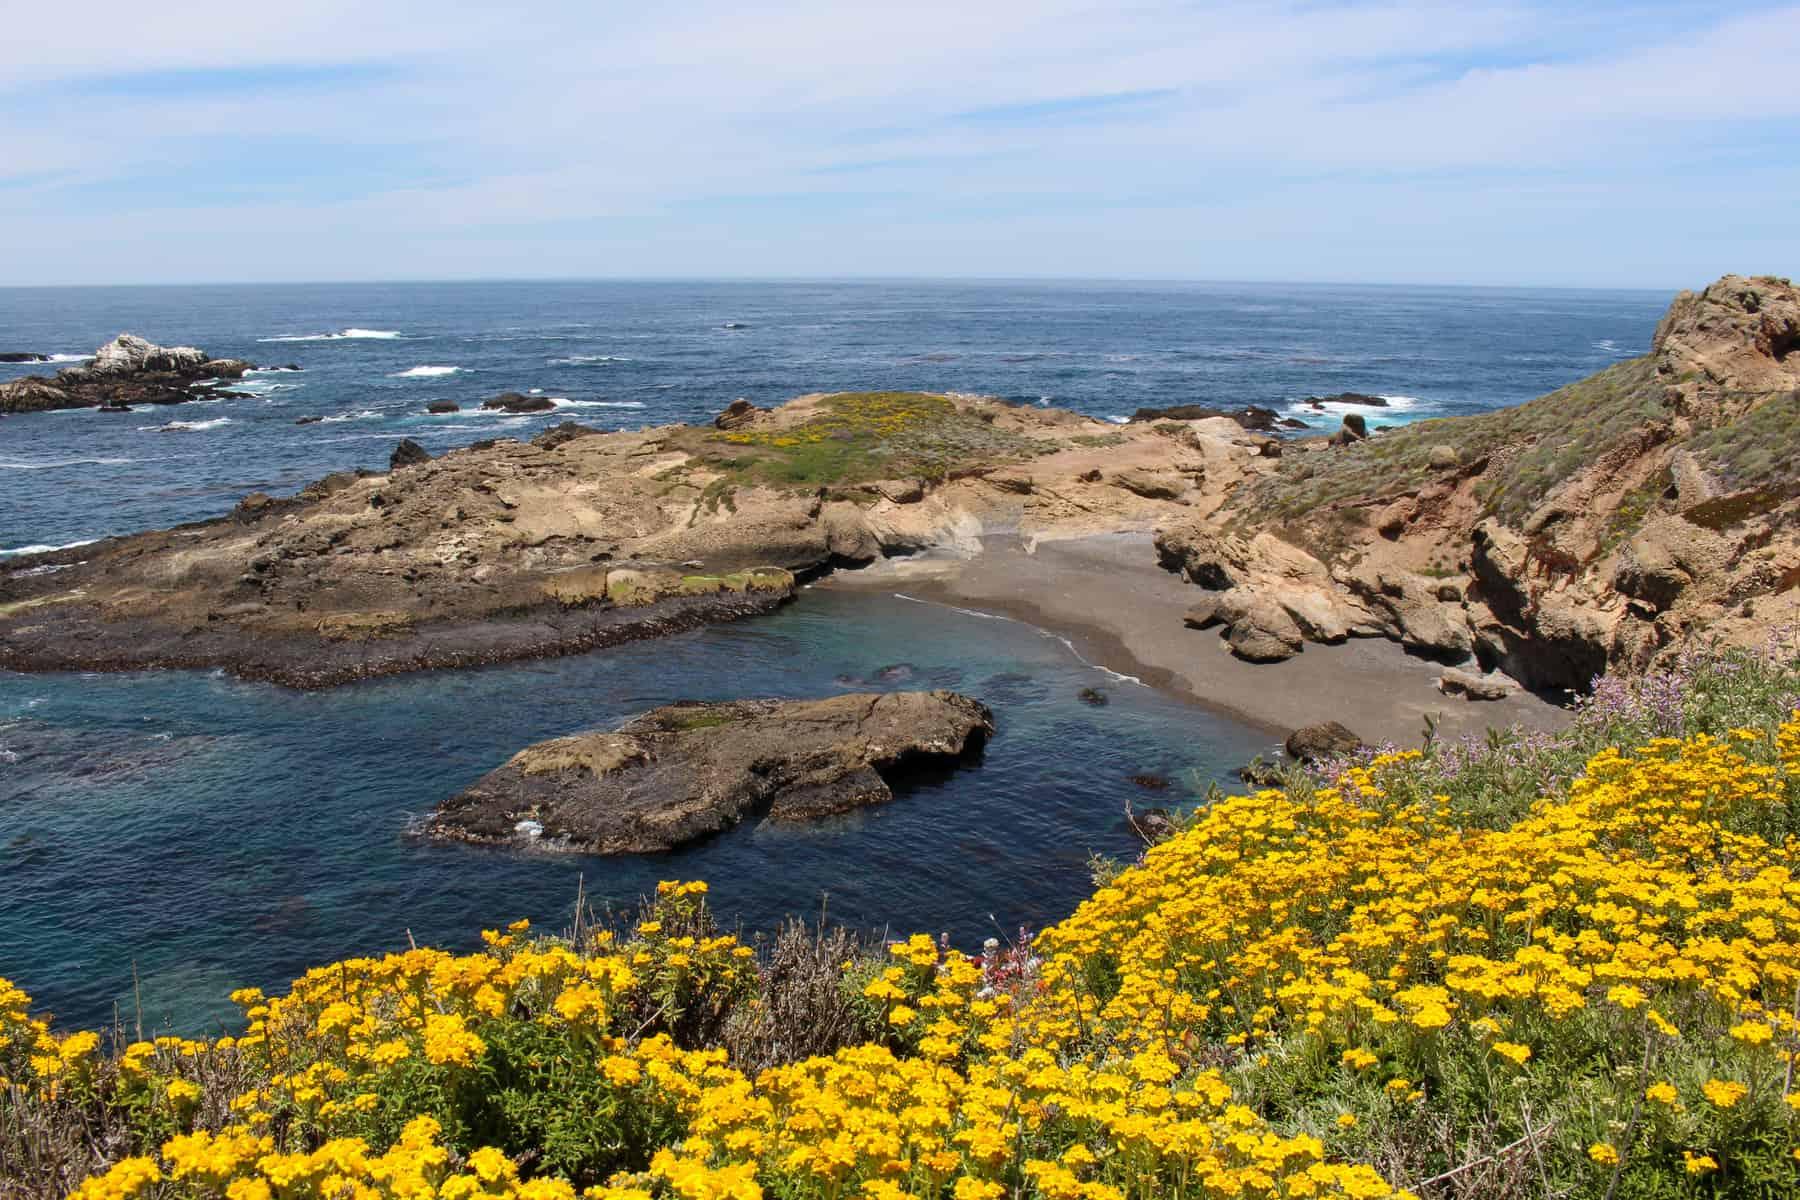 Sea Lion Cove in Point Lobos